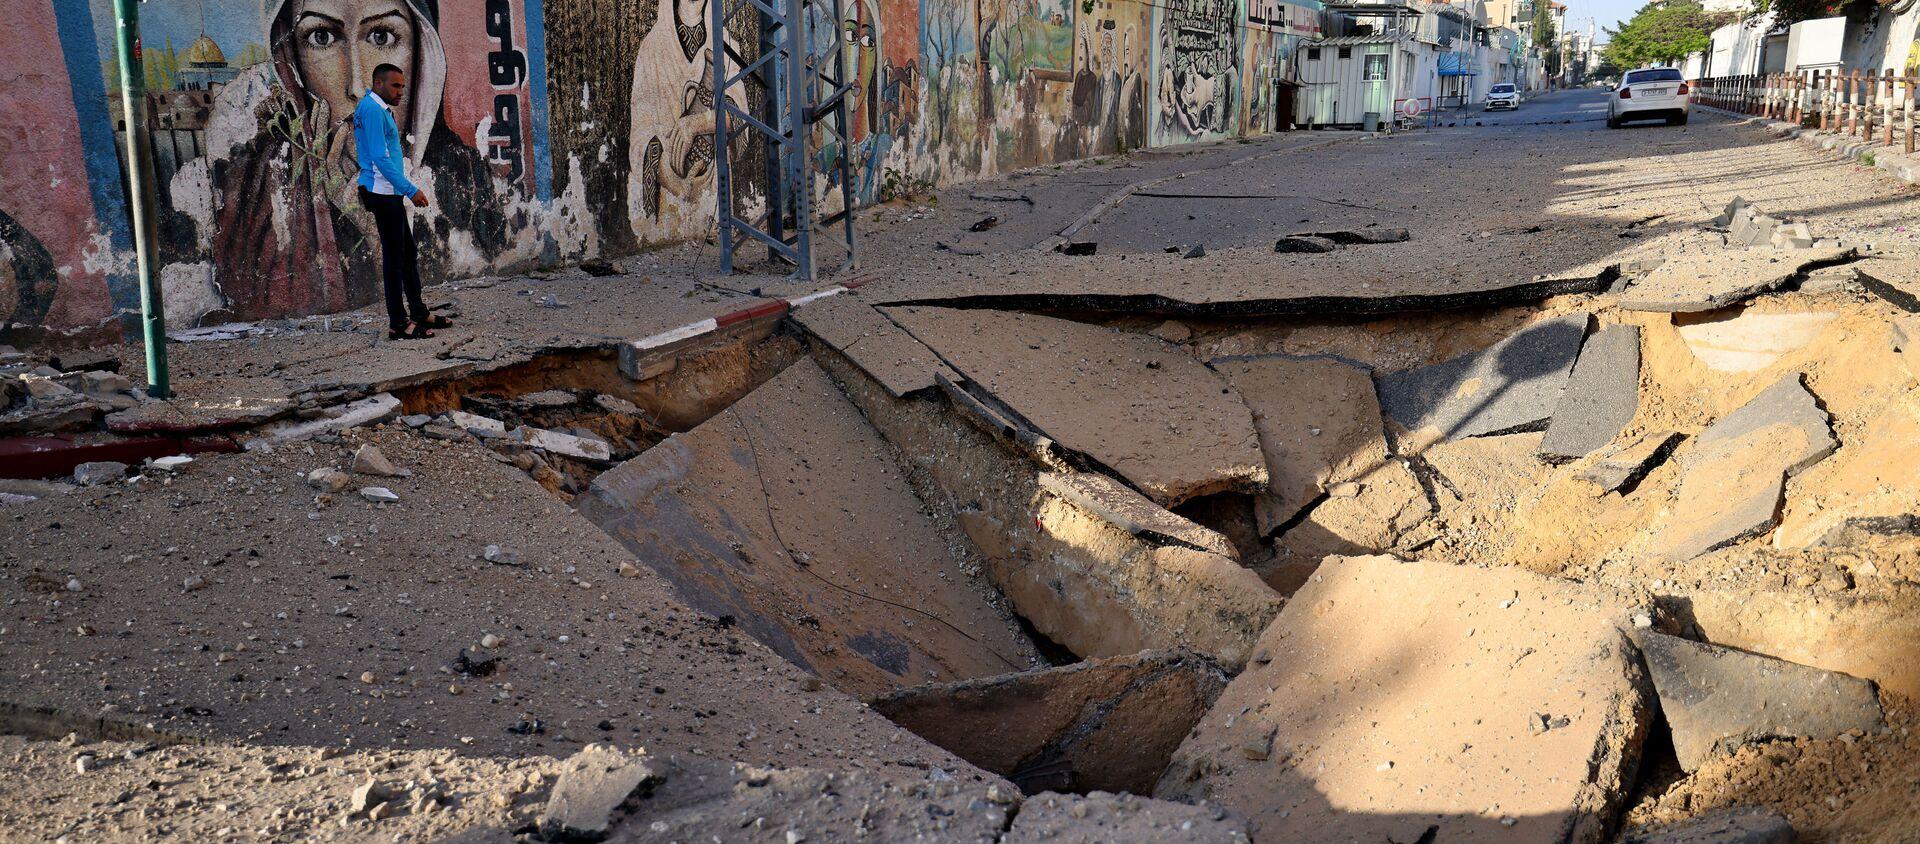 Una strada colpita da un razzo a Gaza - Sputnik Italia, 1920, 13.05.2021